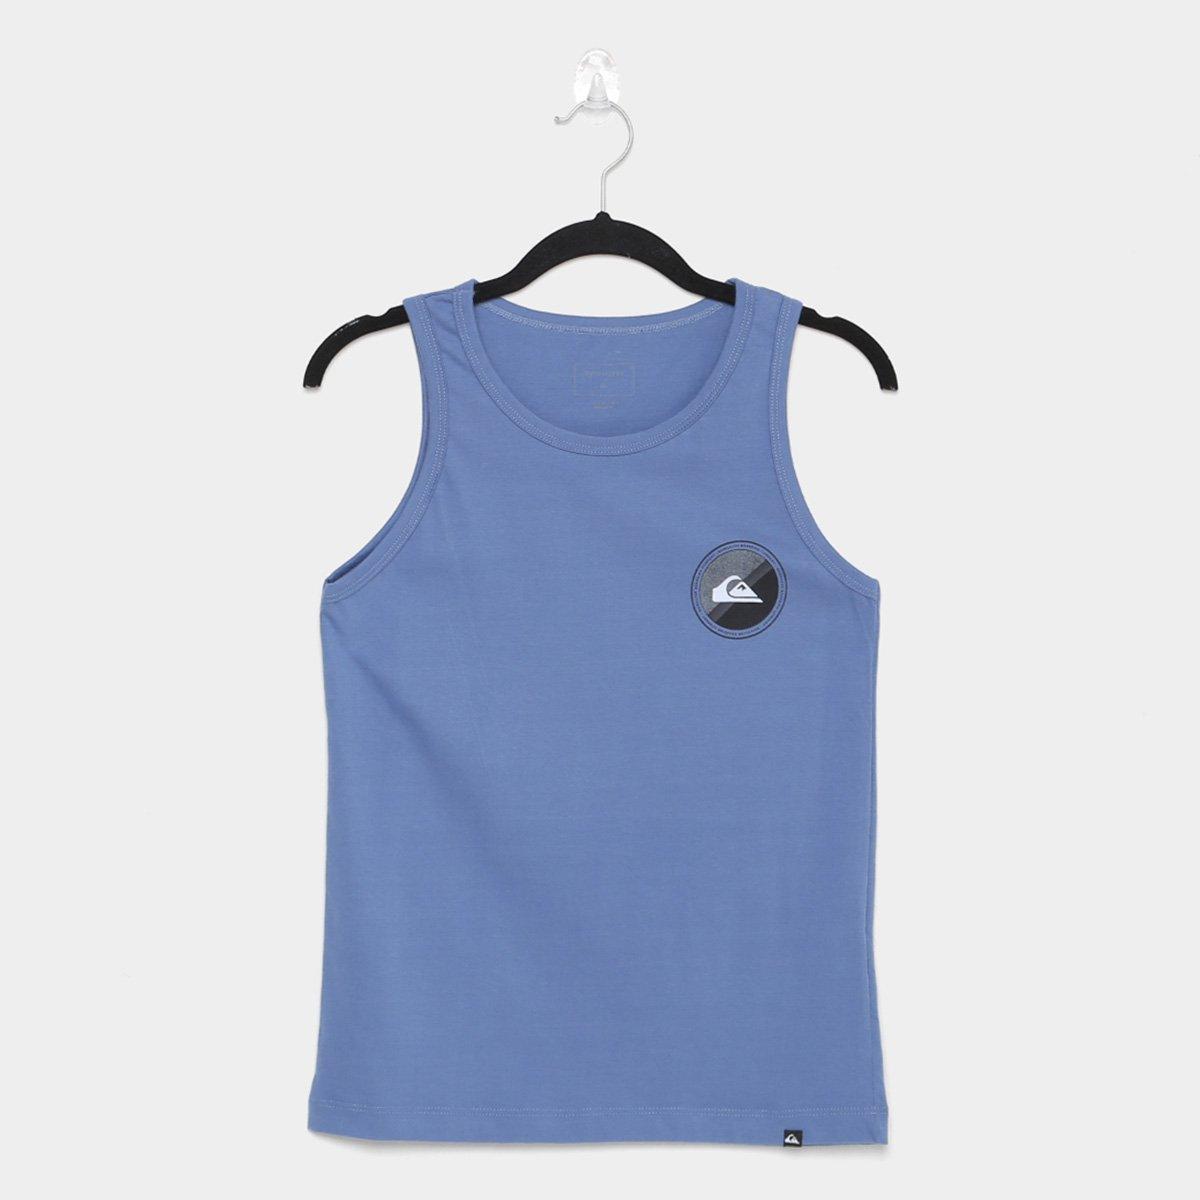 Camiseta Regata Infantil Quiksilver Board Masculina